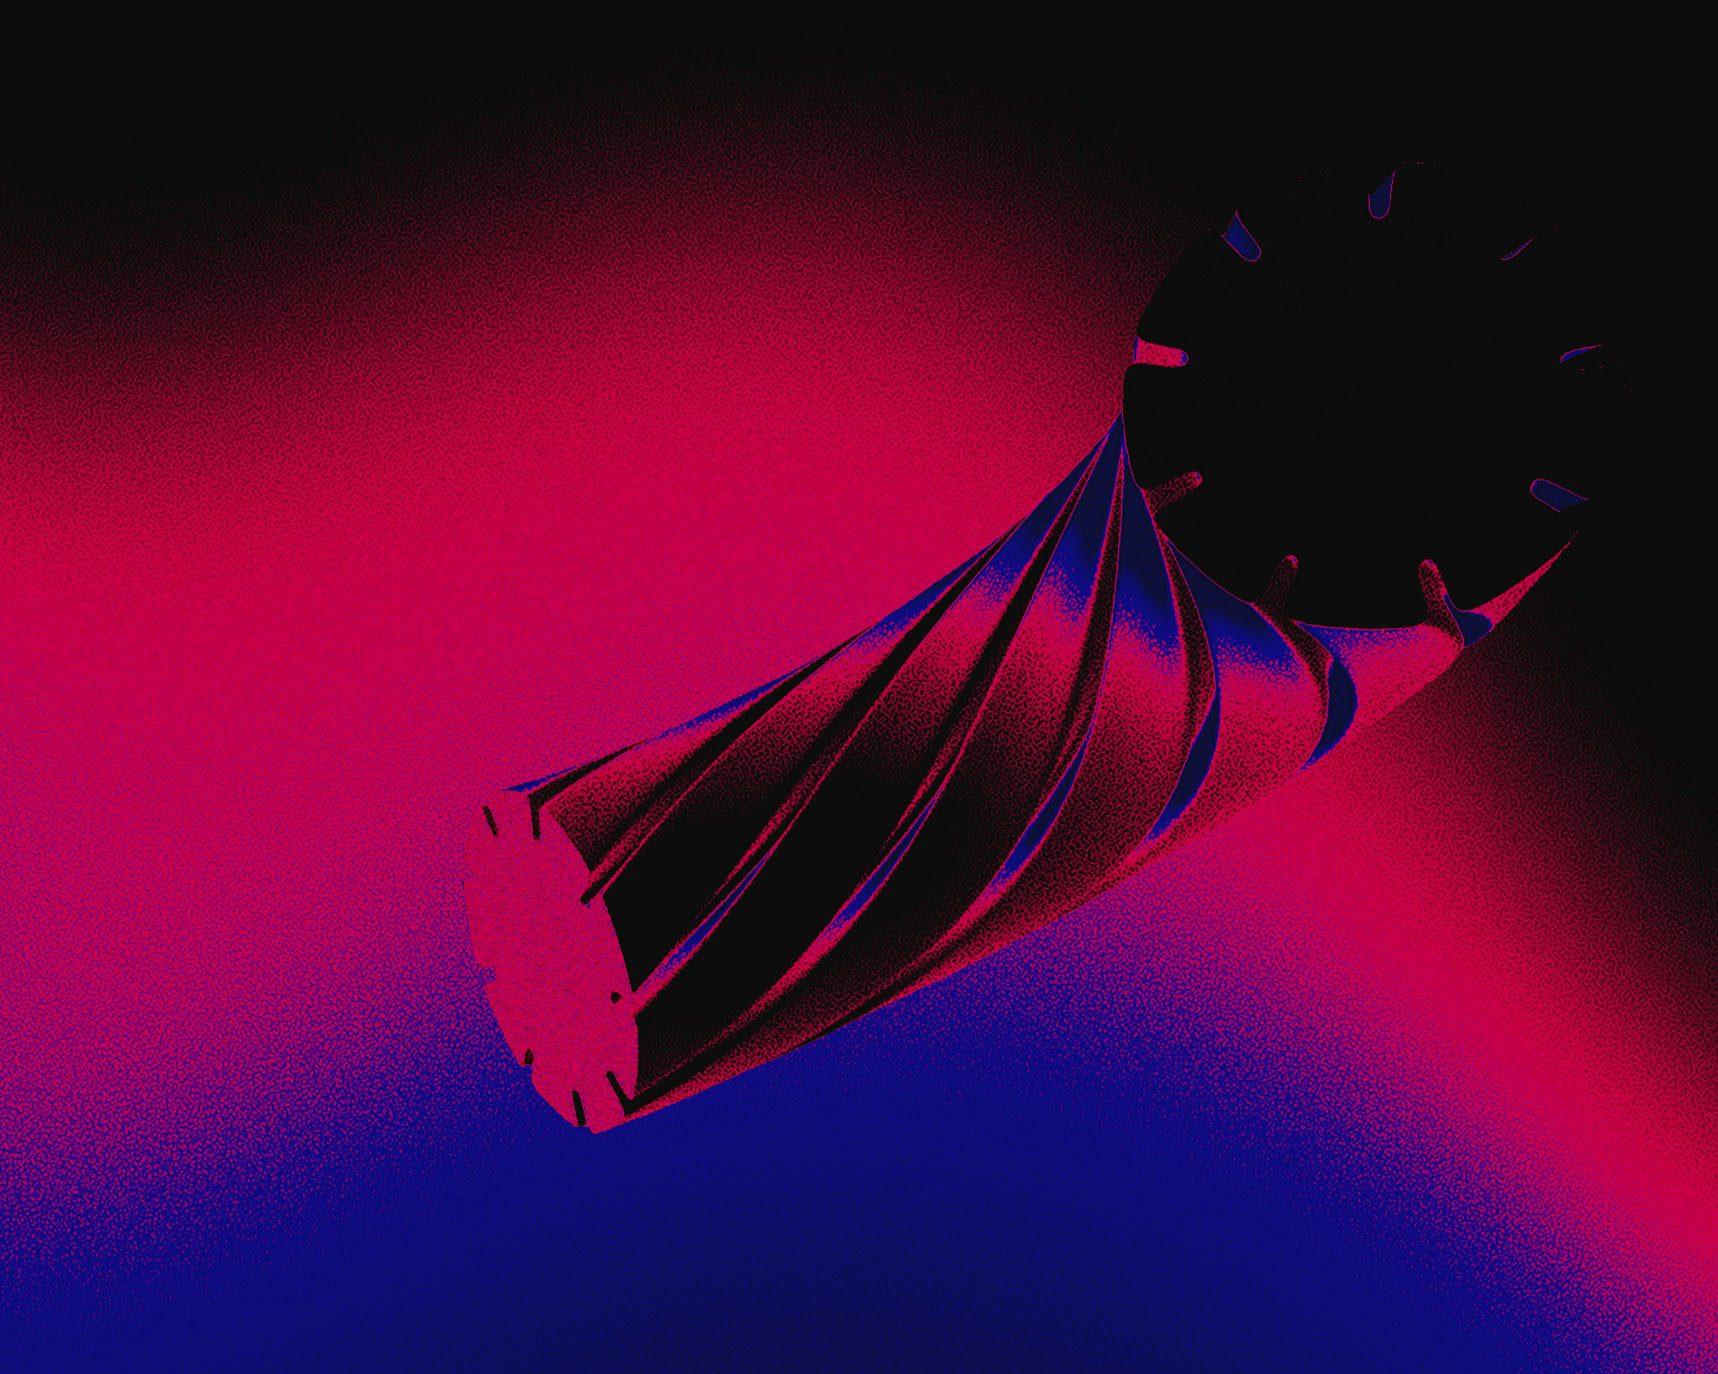 Graphic design picture of Heat made by Perimetre creative studio based in Paris